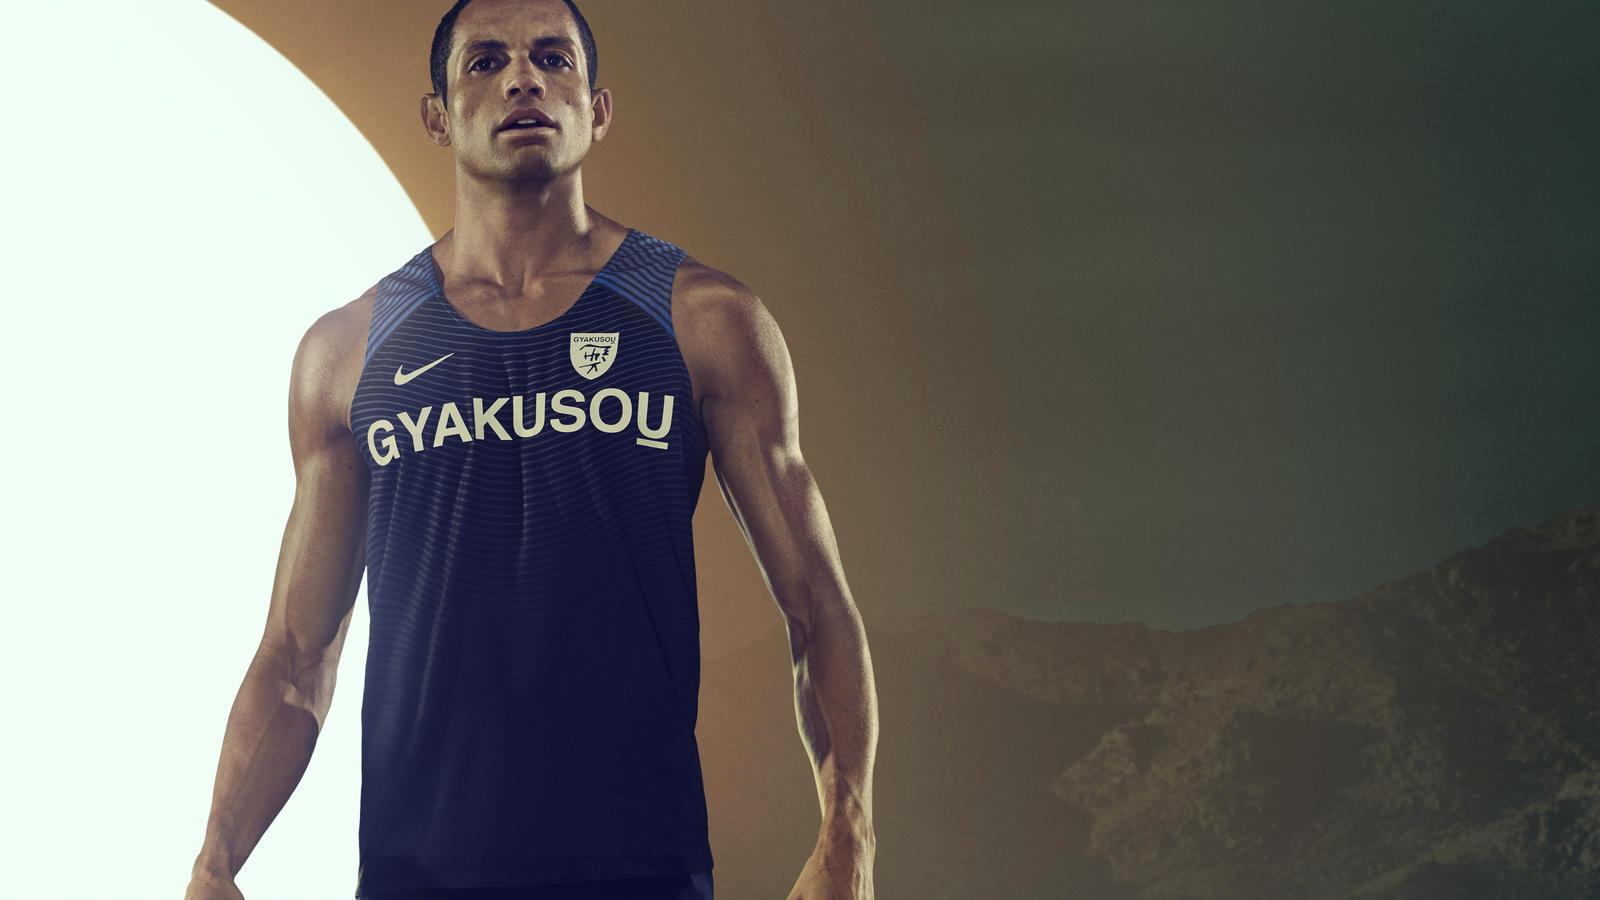 NikeLab_Gyakusou_4_hd_1600